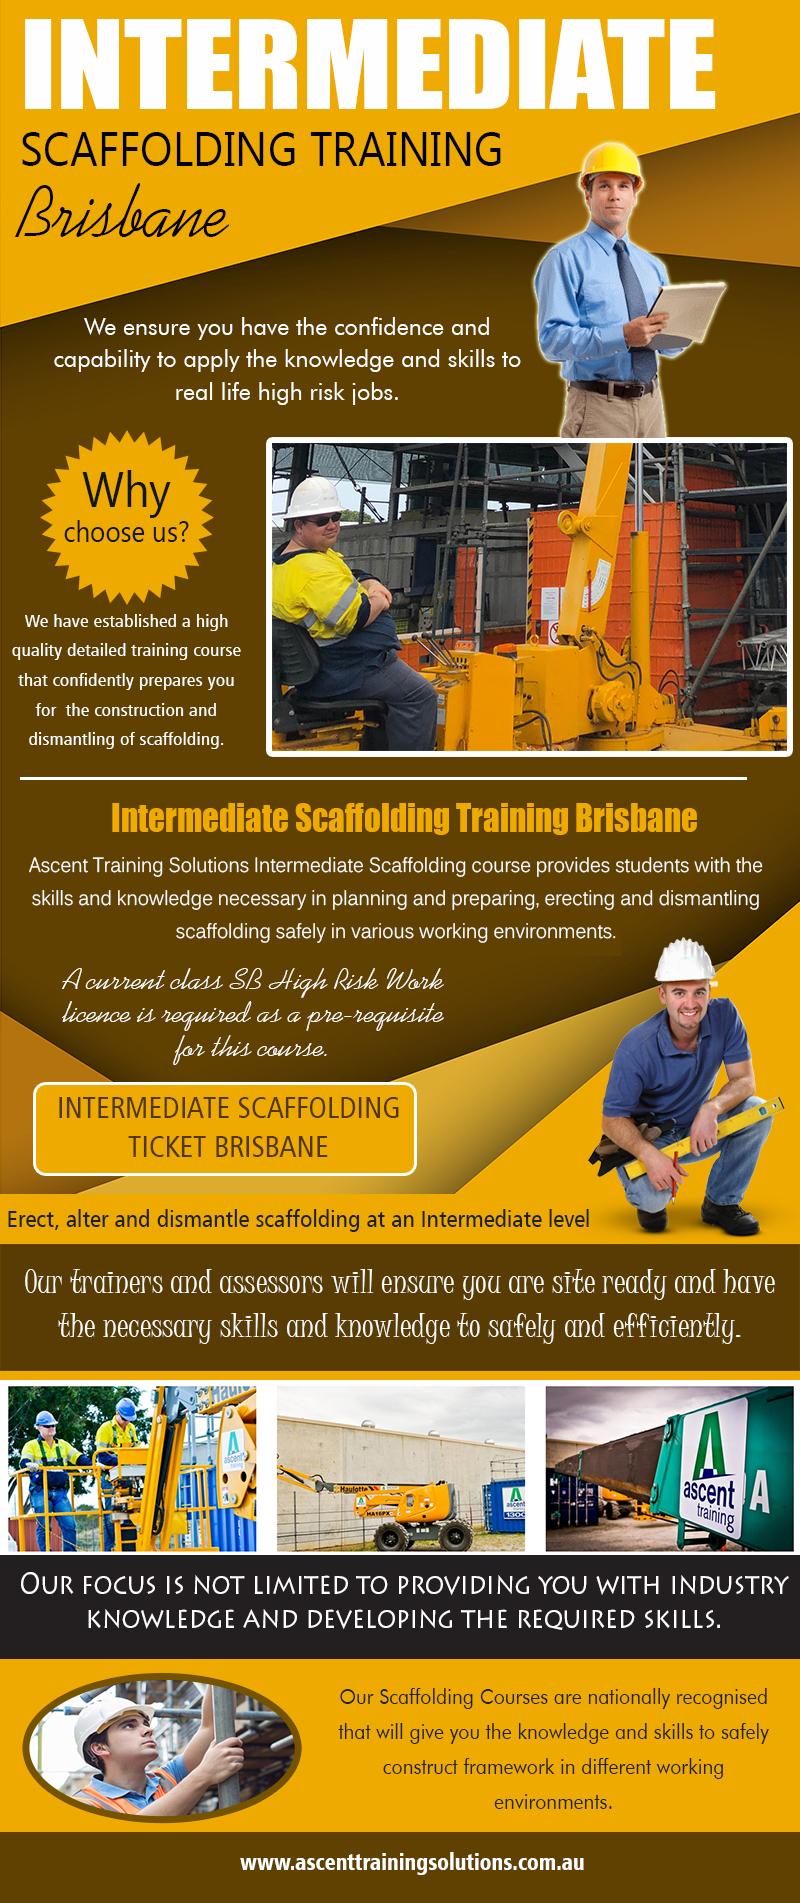 Intermediate Scaffolding Training Brisbane